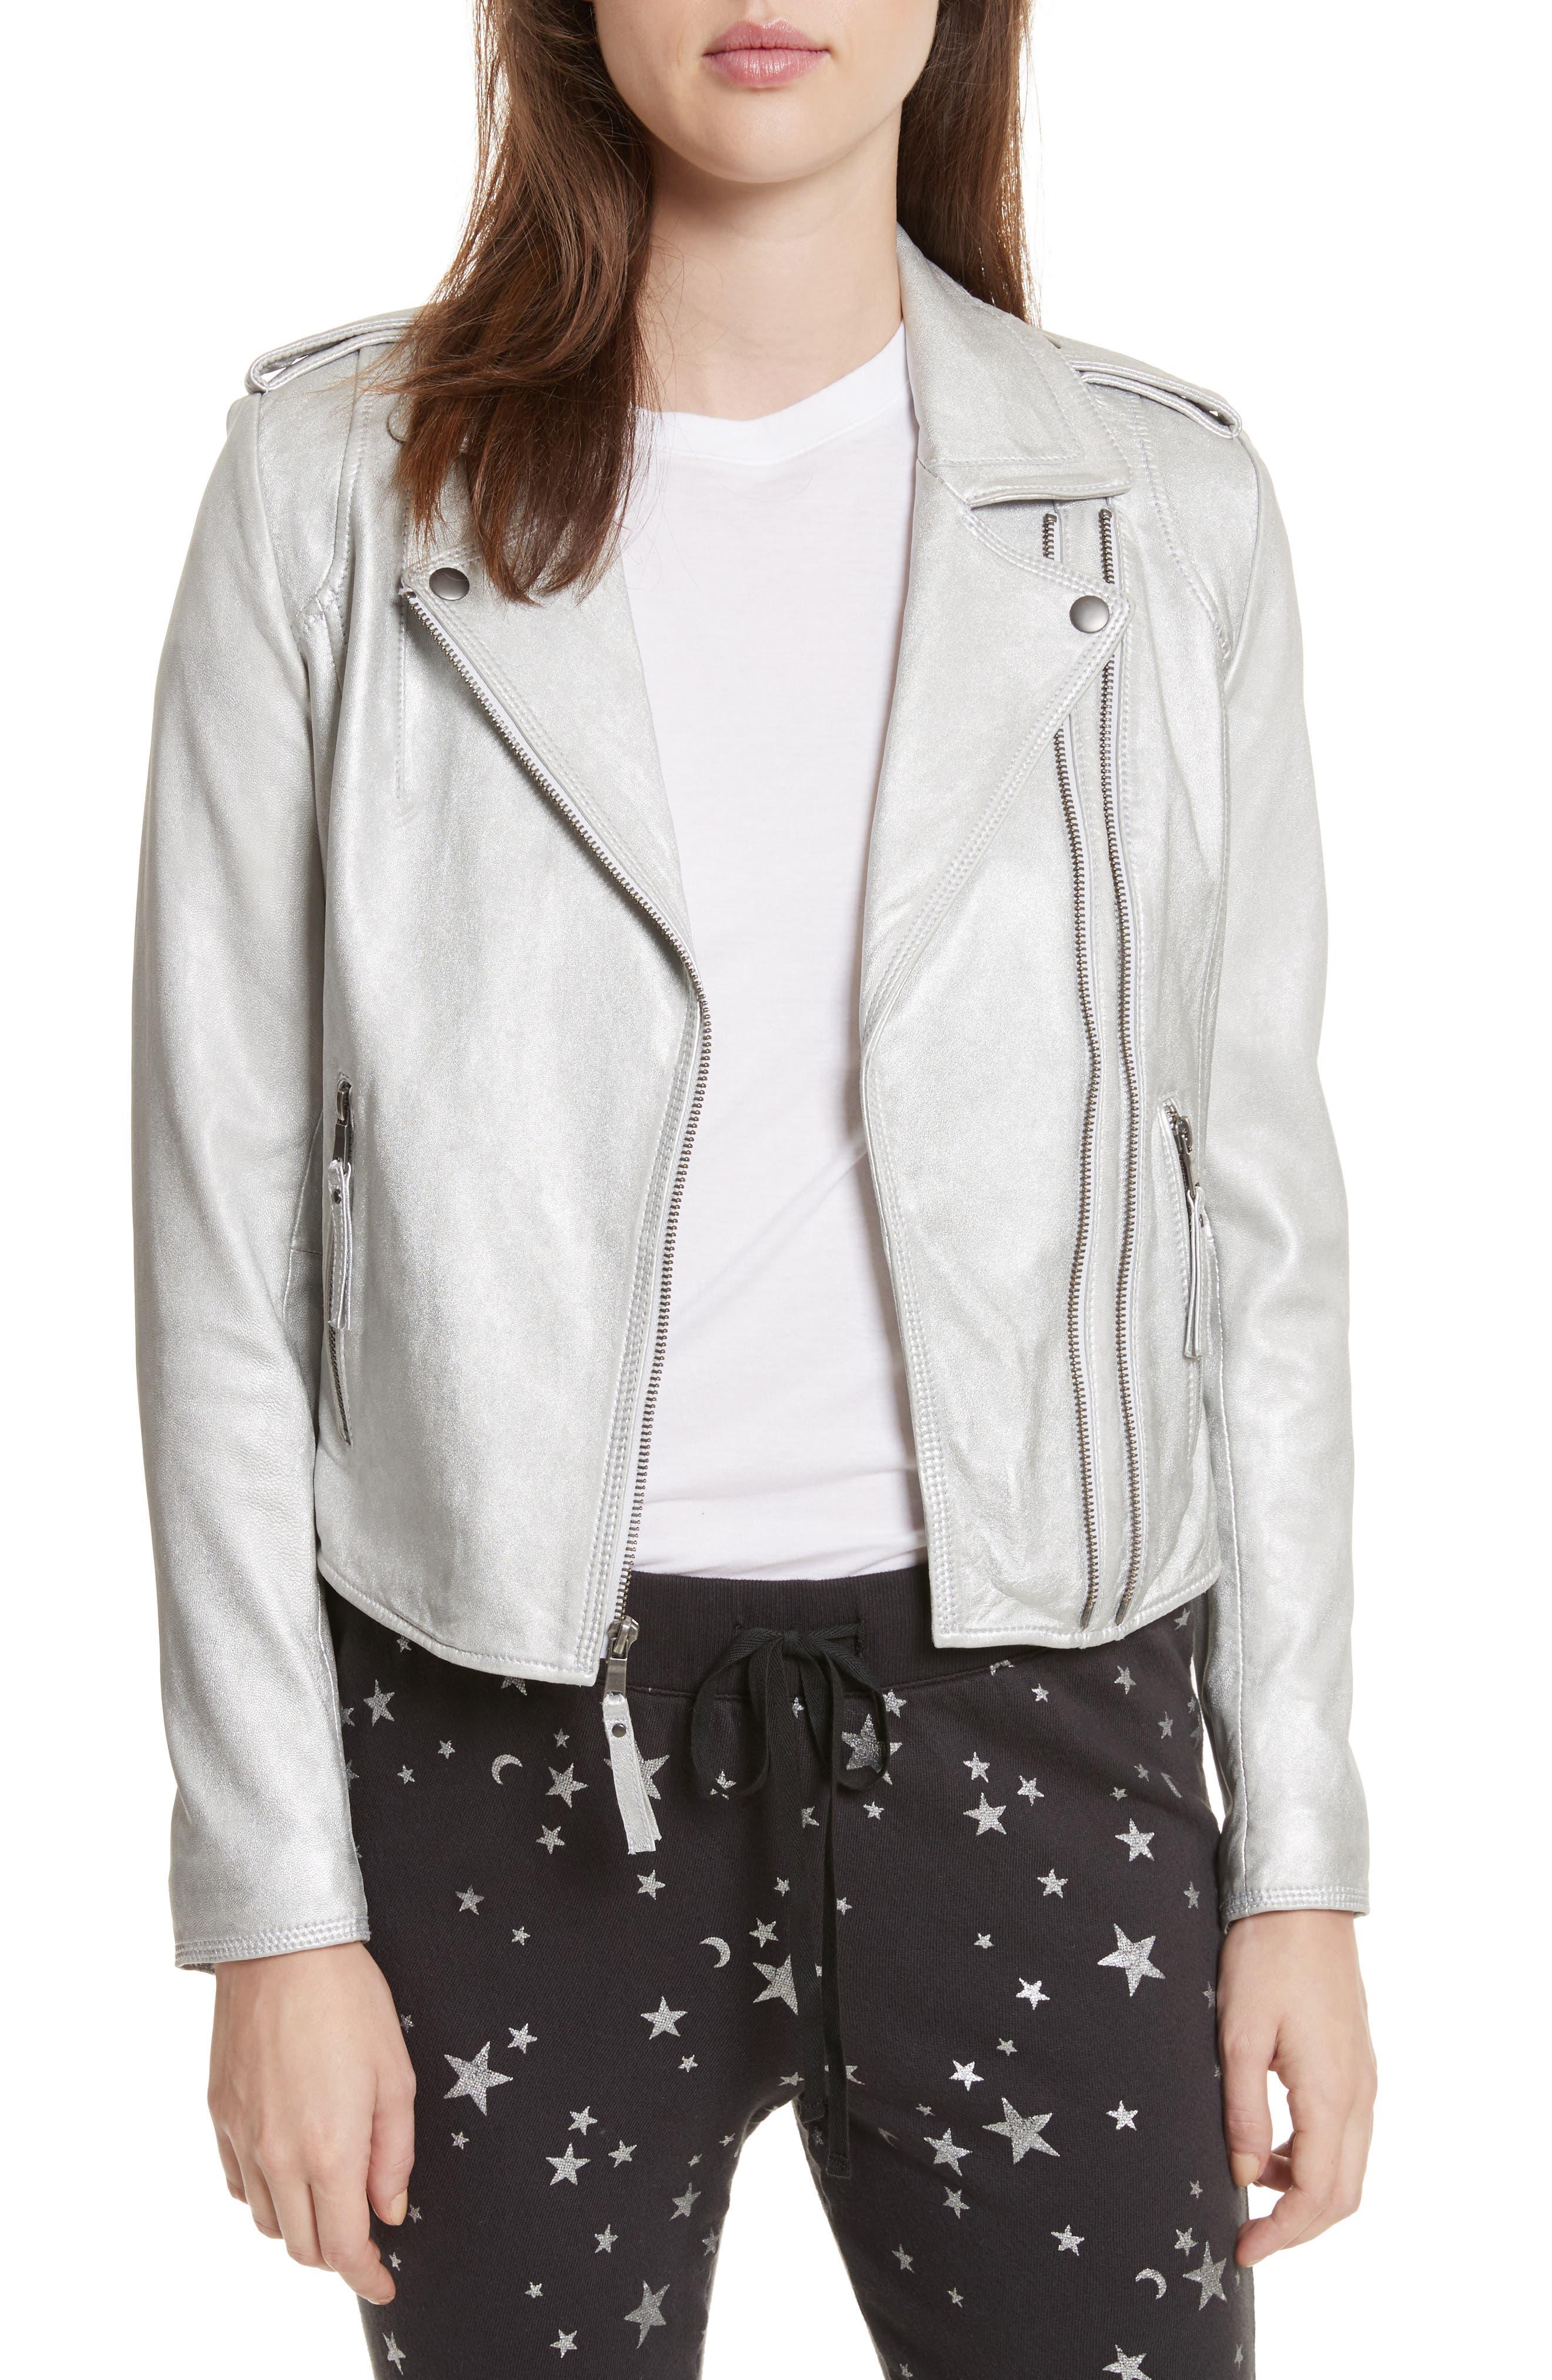 Leolani Leather Jacket,                             Main thumbnail 1, color,                             Silver